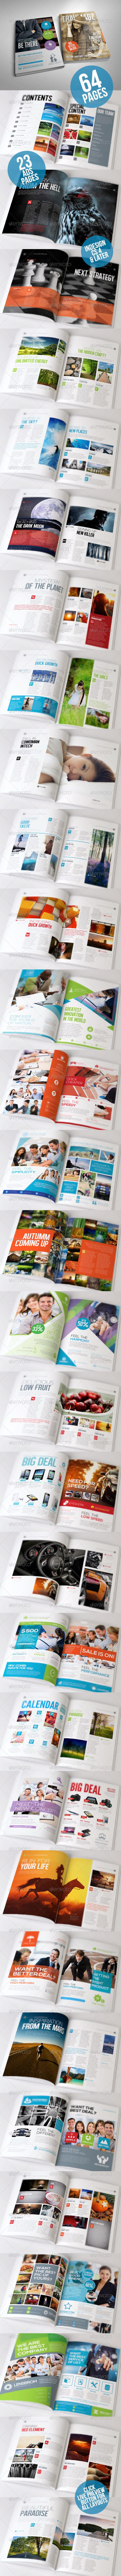 Simple Magazine Volume II - Magazines Print Templates